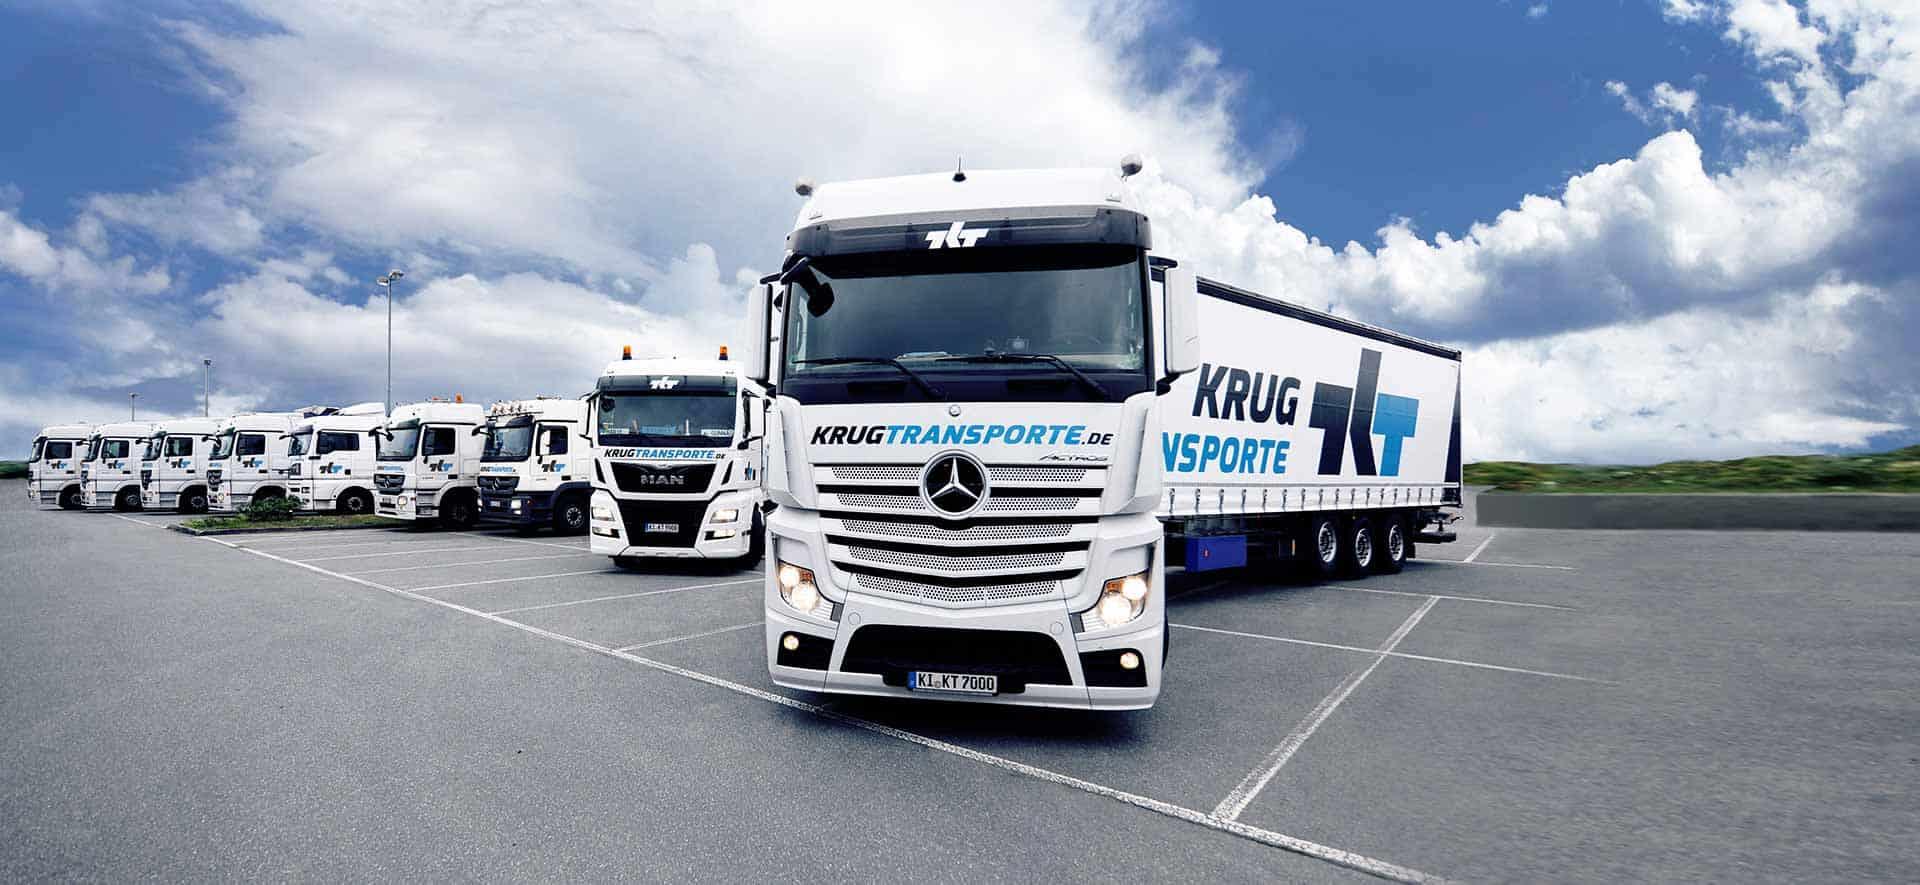 krug-transporte-neu-lkw